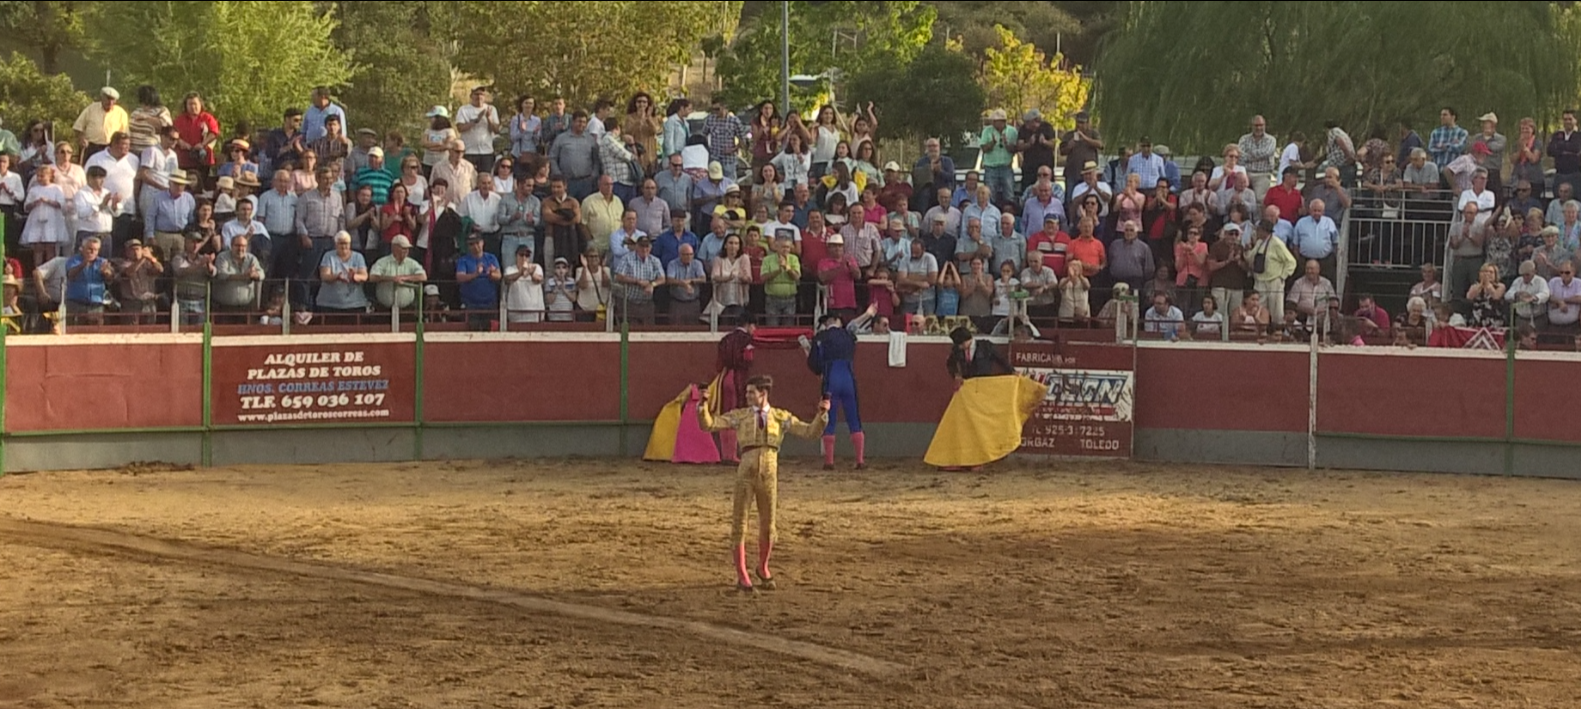 El Rafi coupe 2 oreilles à Tamames (Salamanca)...